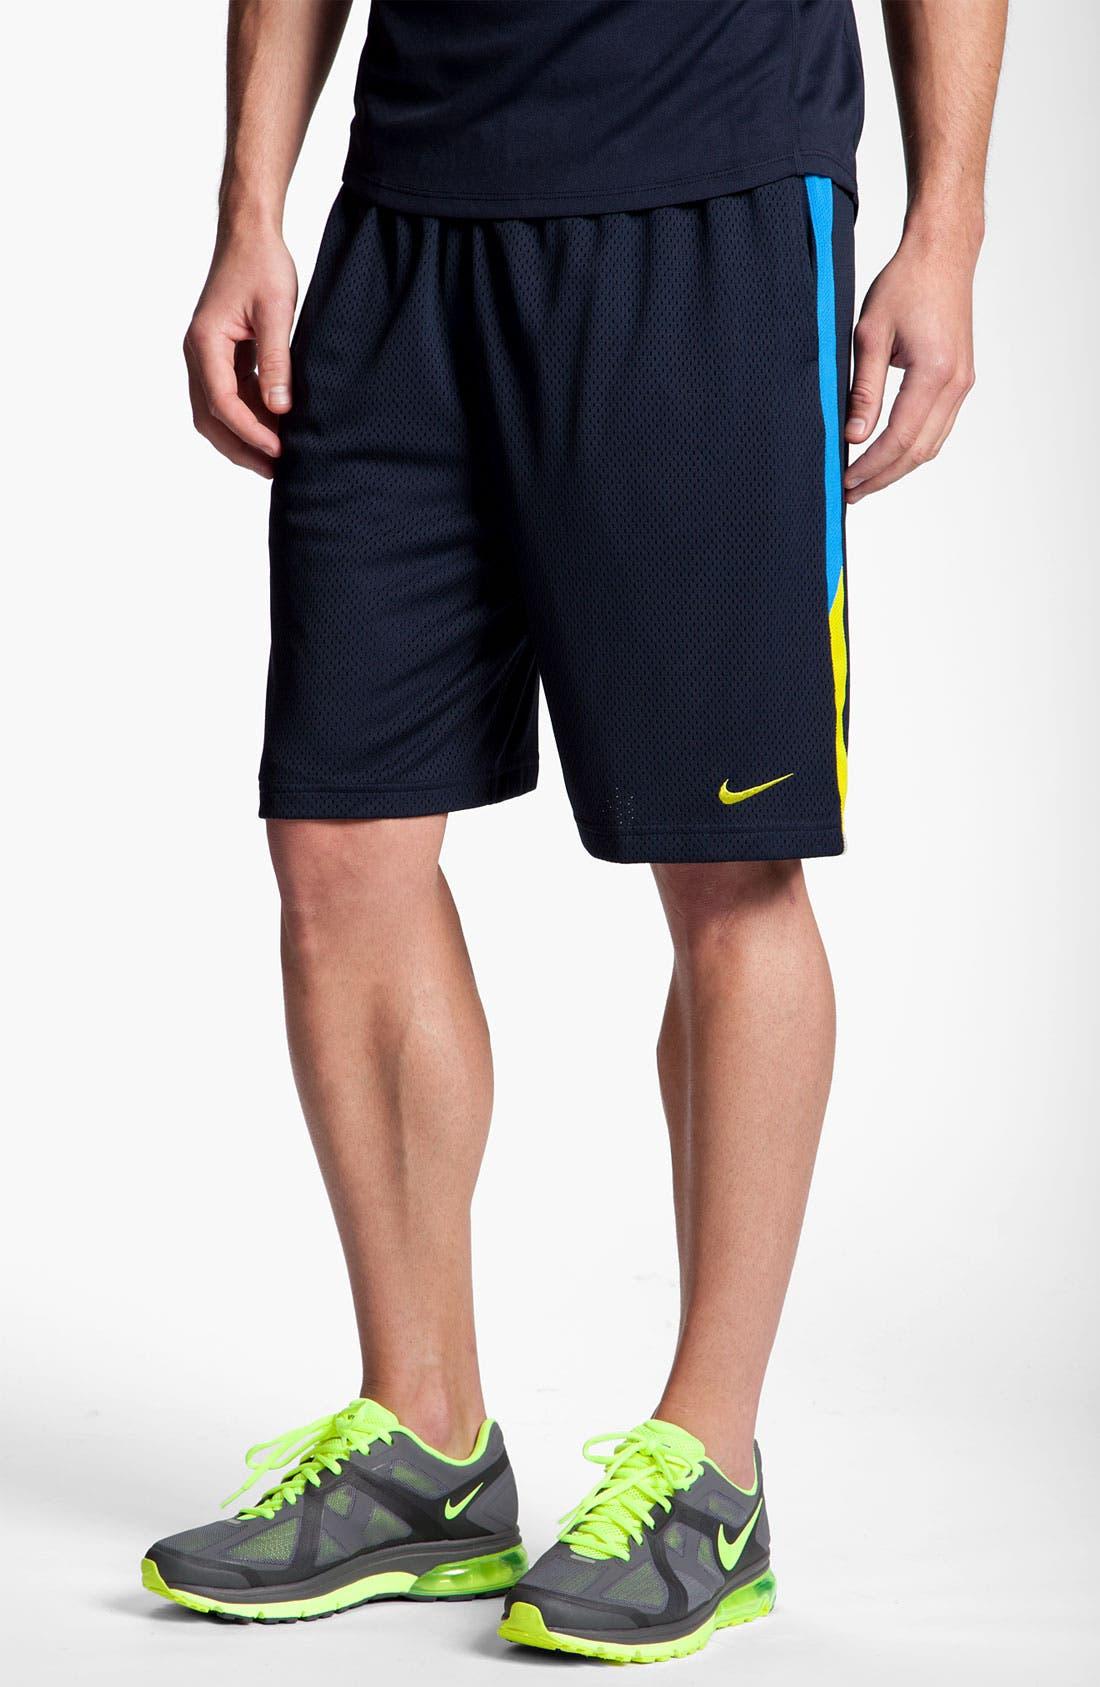 Main Image - Nike 'Monster' Dri-FIT Shorts